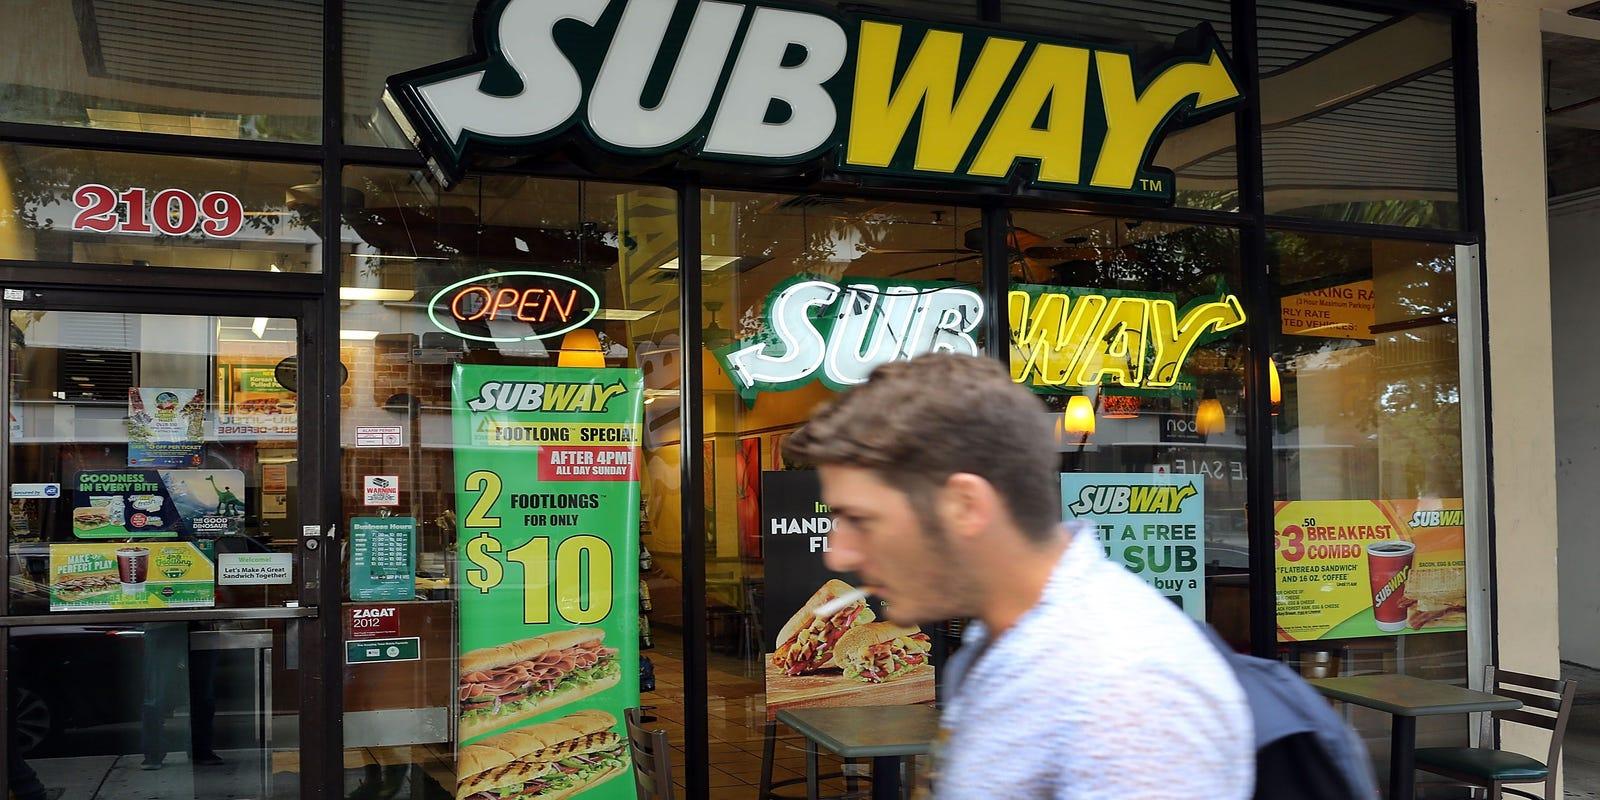 subway has a new logo business insider